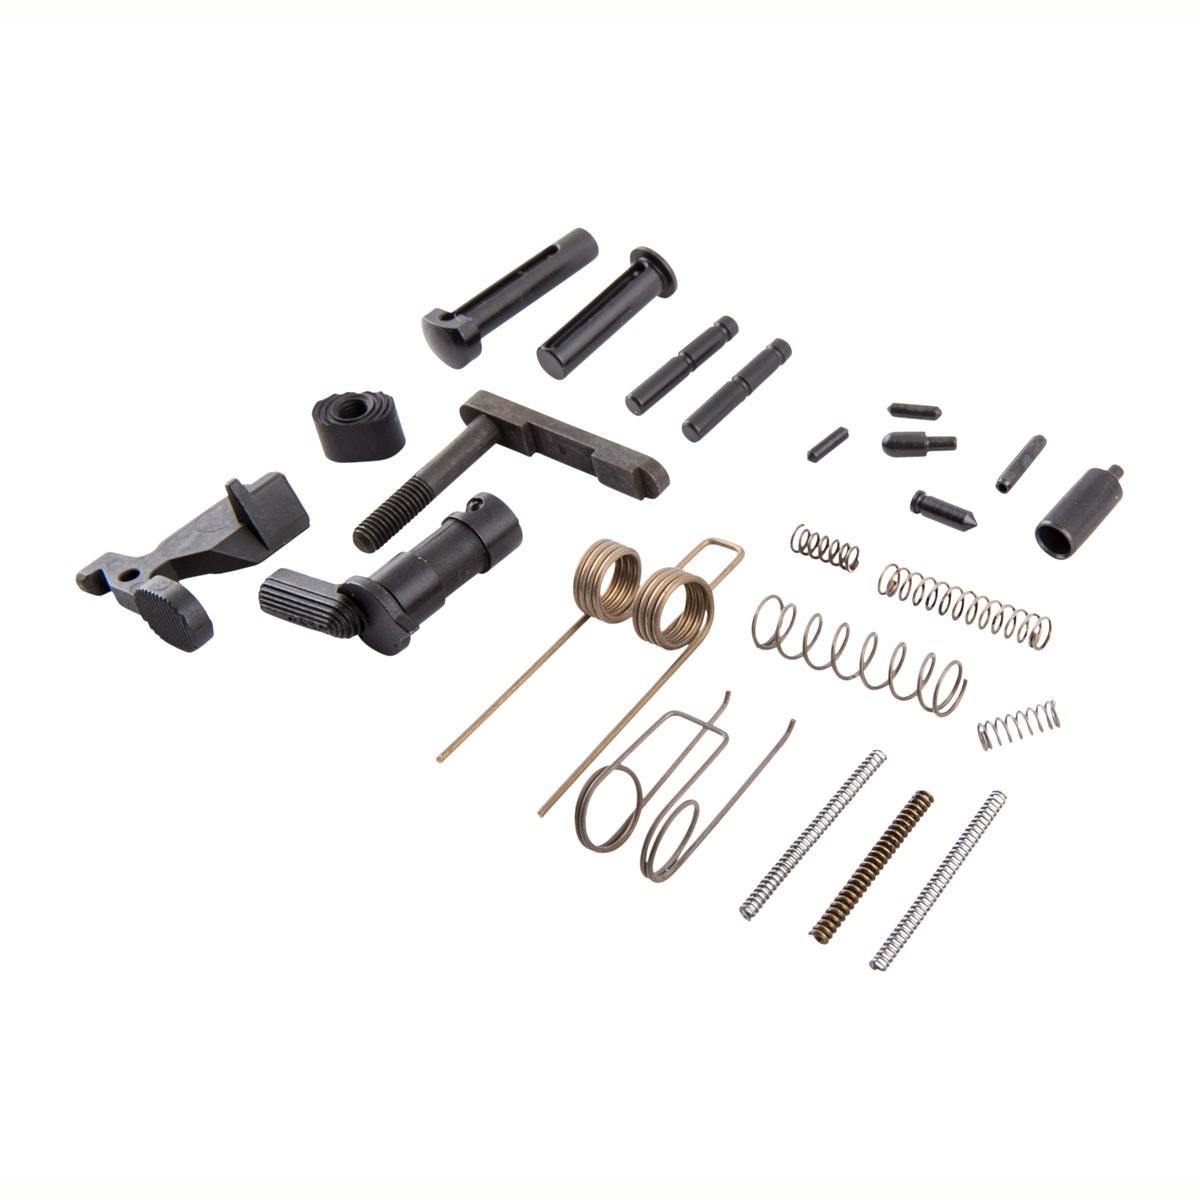 Ar 15 Lower Parts Builder Kit Critical Capabilities Llc